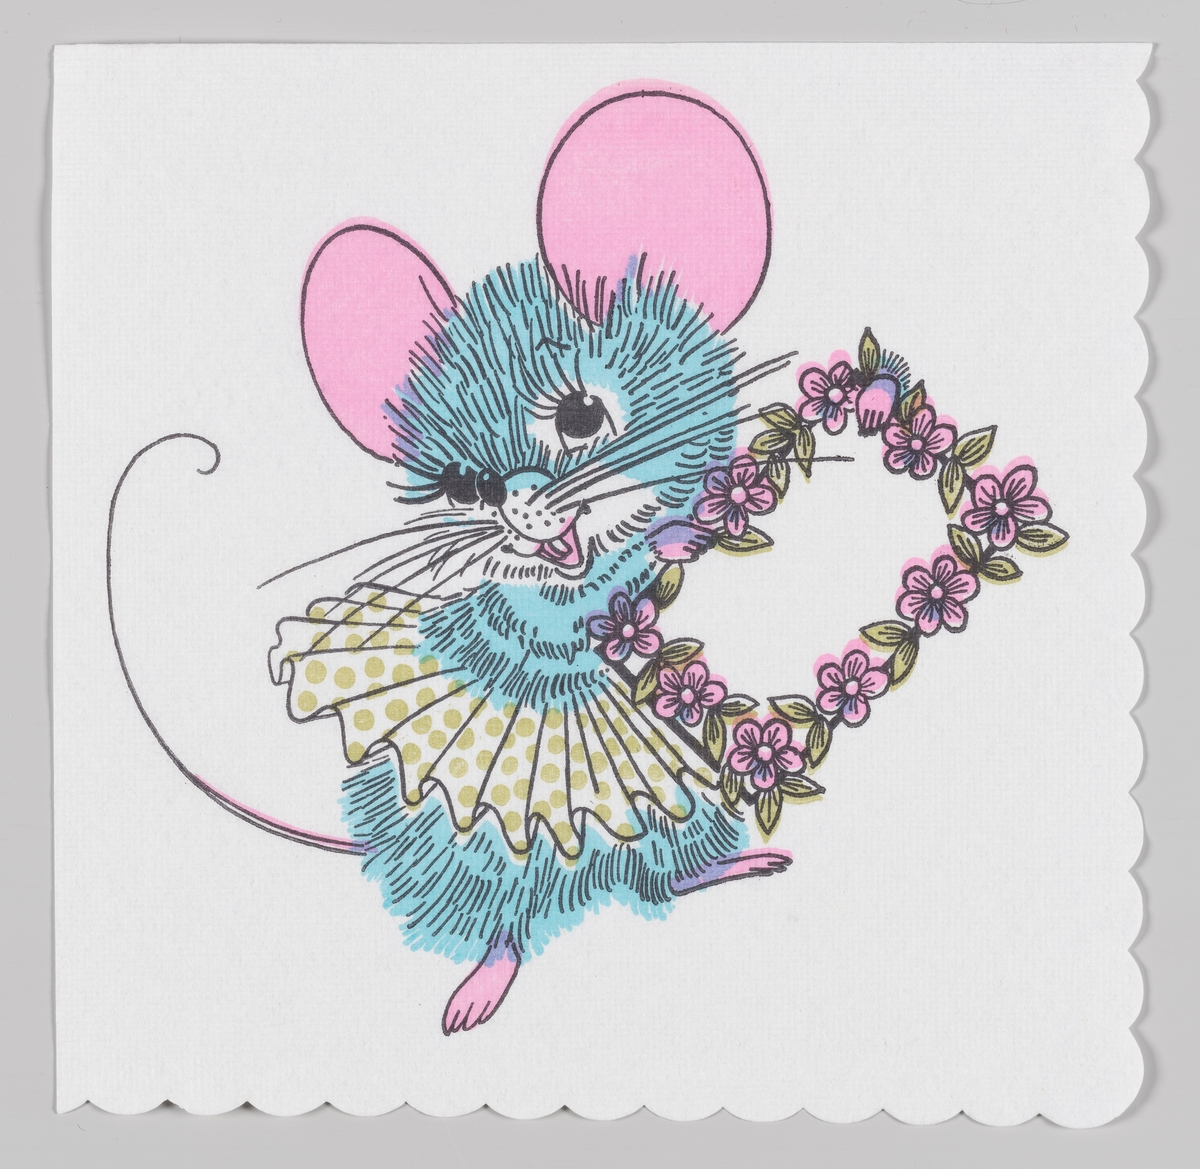 En mus med skjørt og en billedramme med blomster.